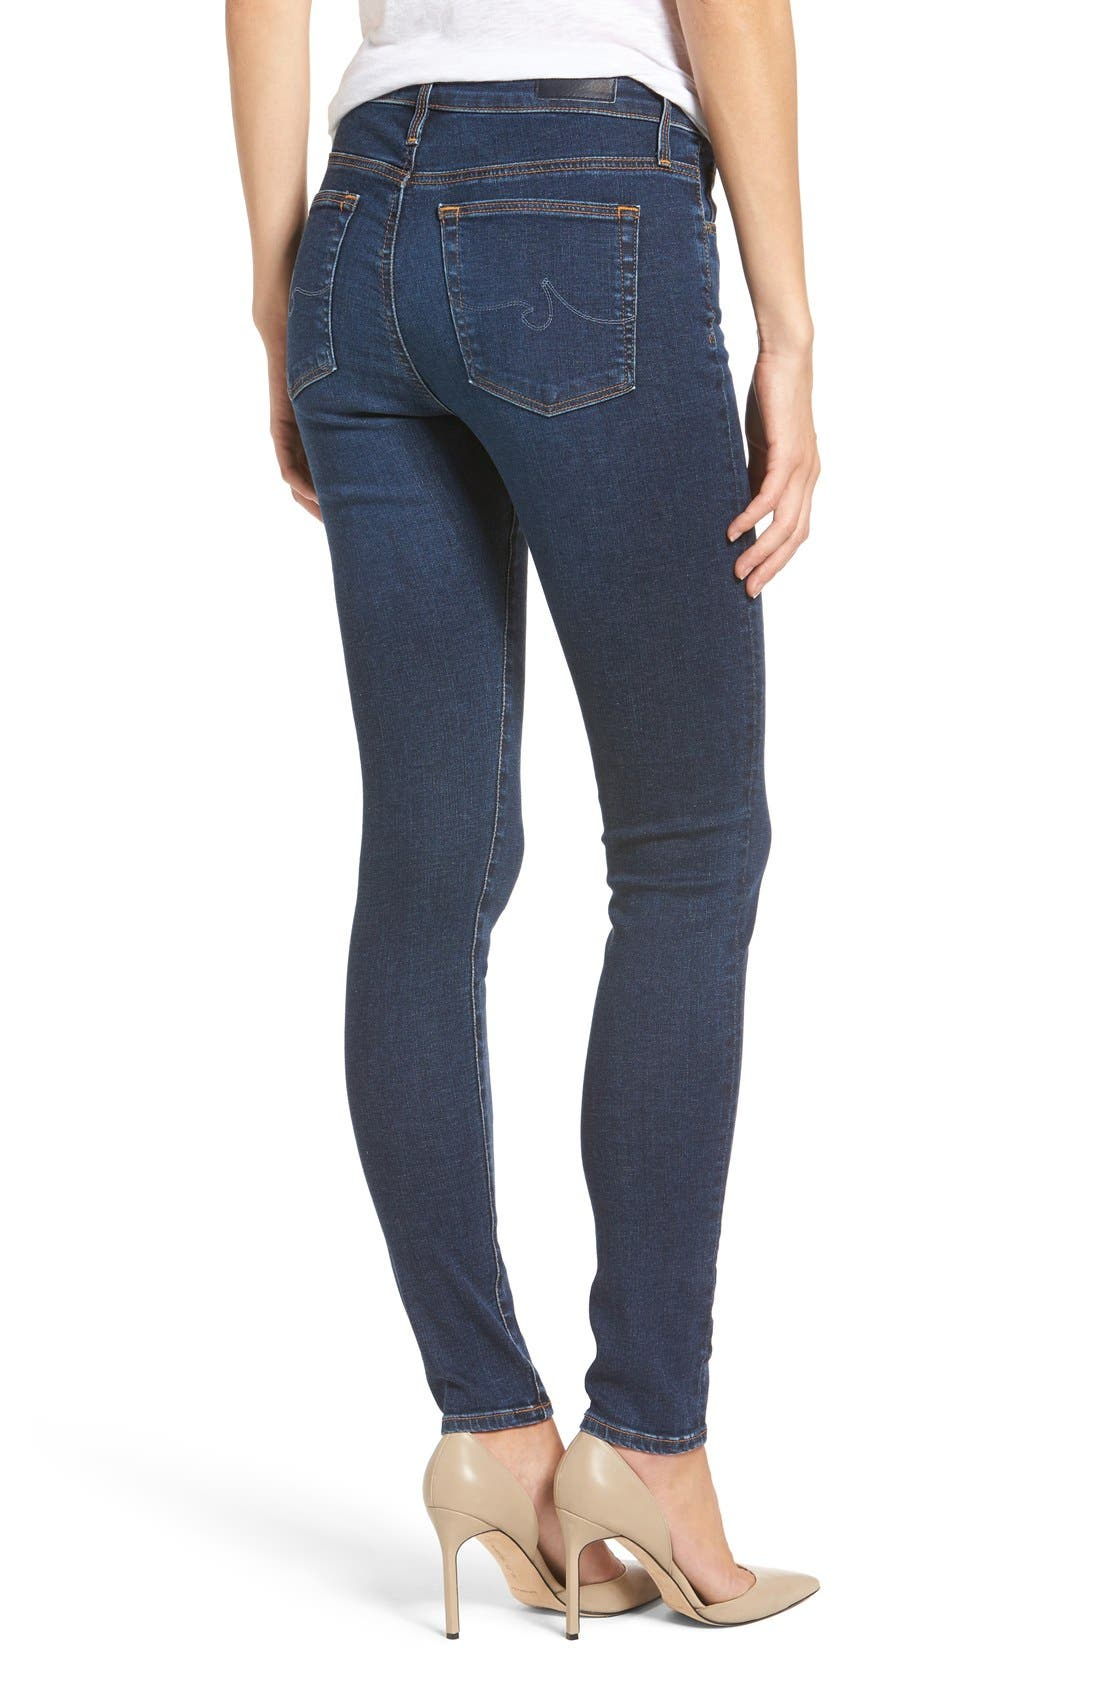 'The Farrah' High Rise Skinny Jeans,                             Alternate thumbnail 30, color,